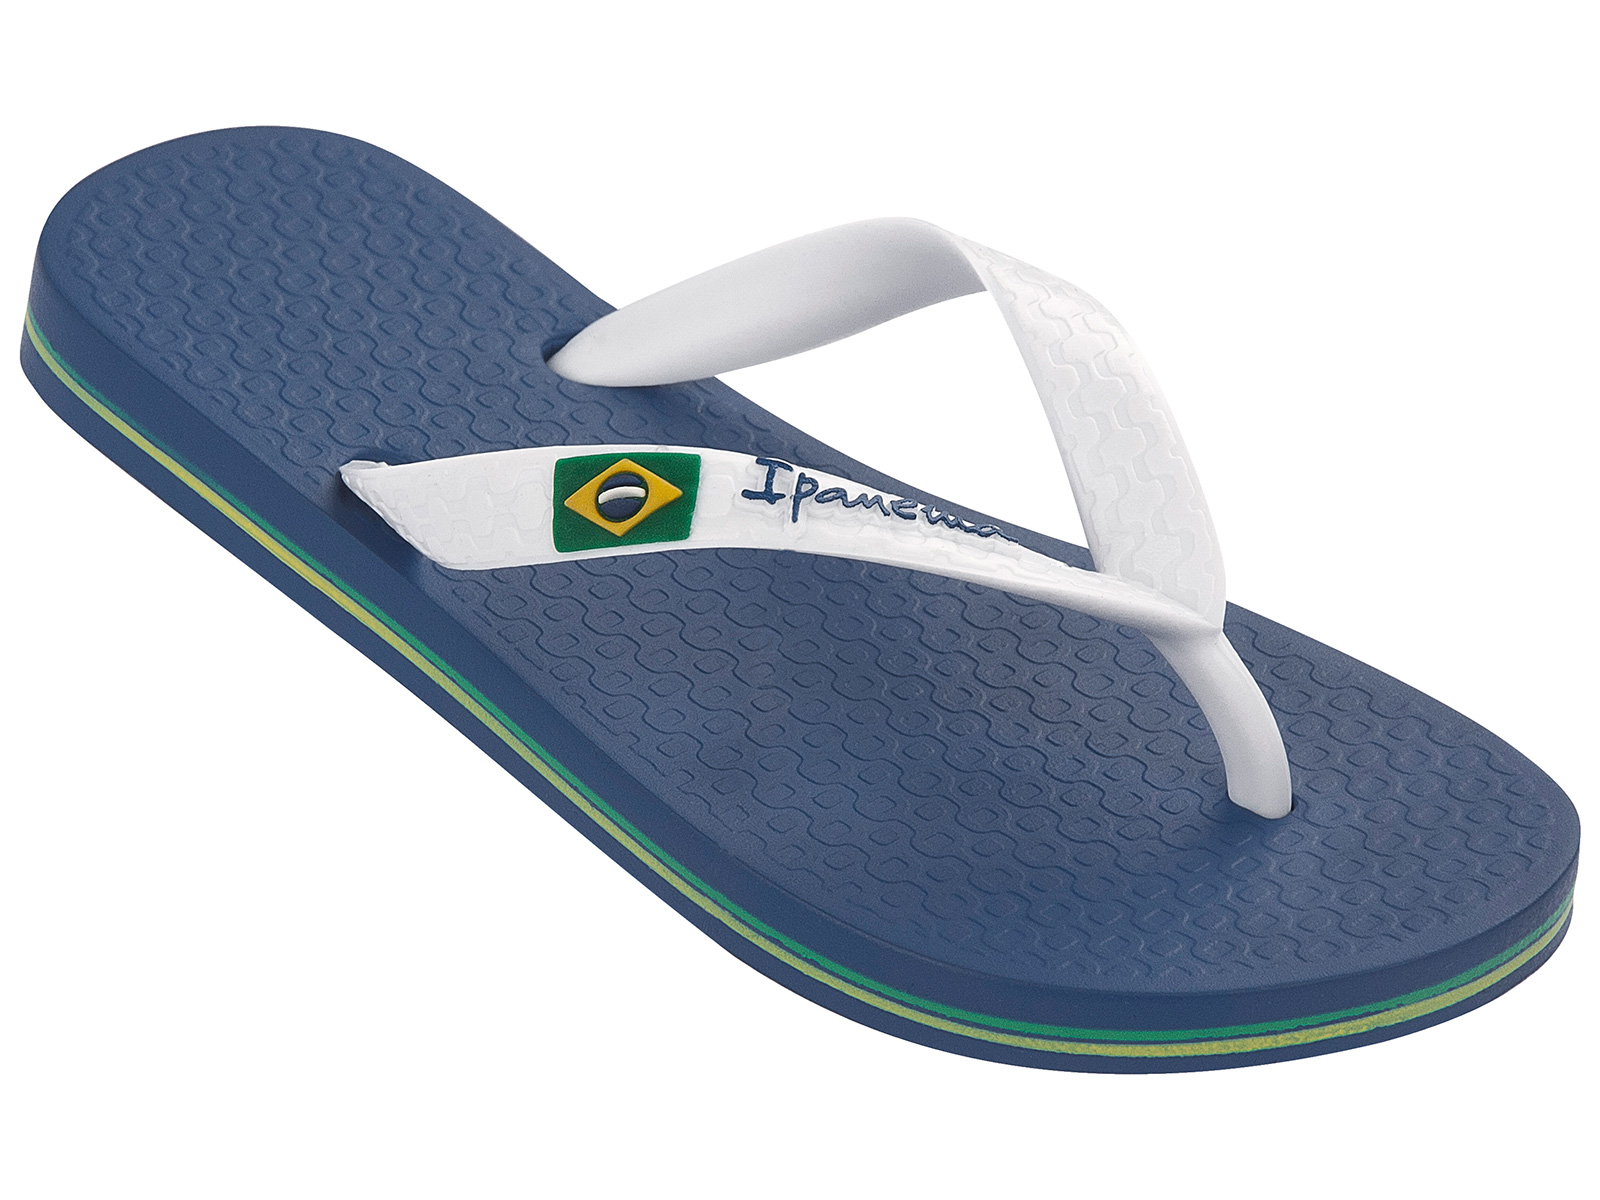 Ipanema Classca Brasil Ii Pantoufles Vgfzx1rzJ